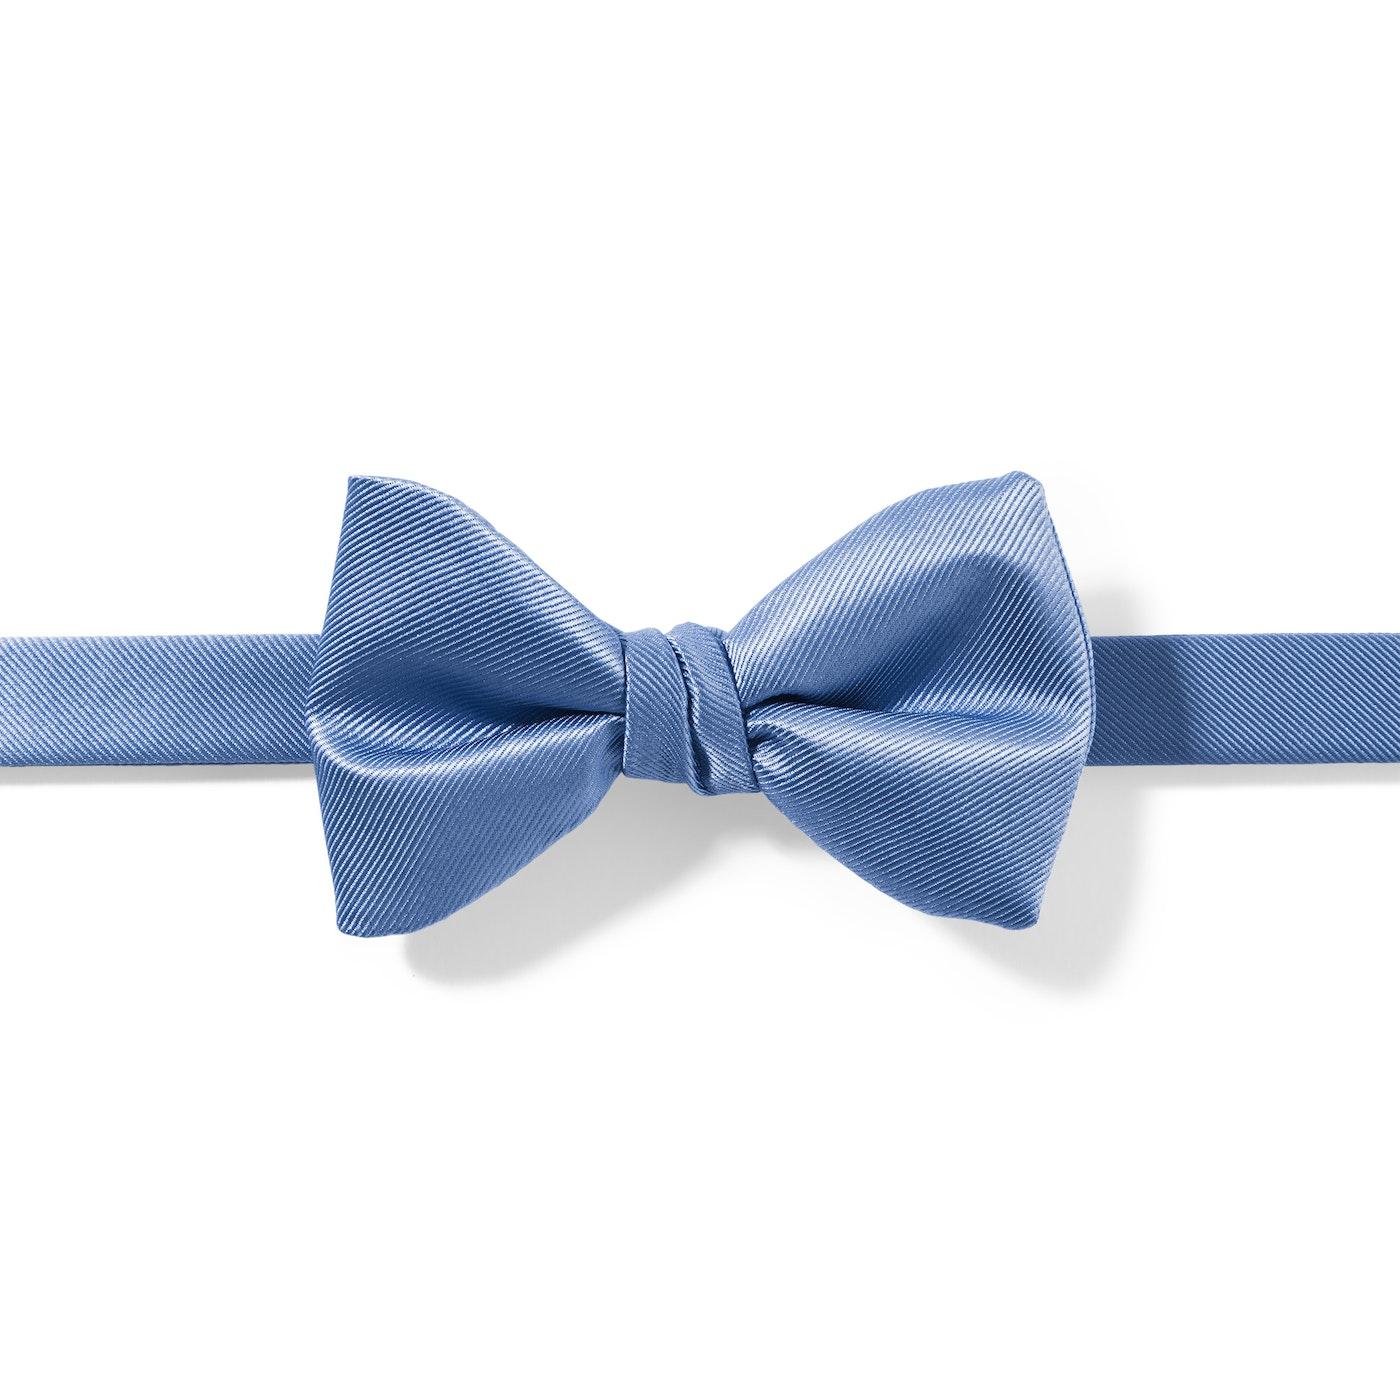 Cornflower Blue Pre-Tied Bow Tie